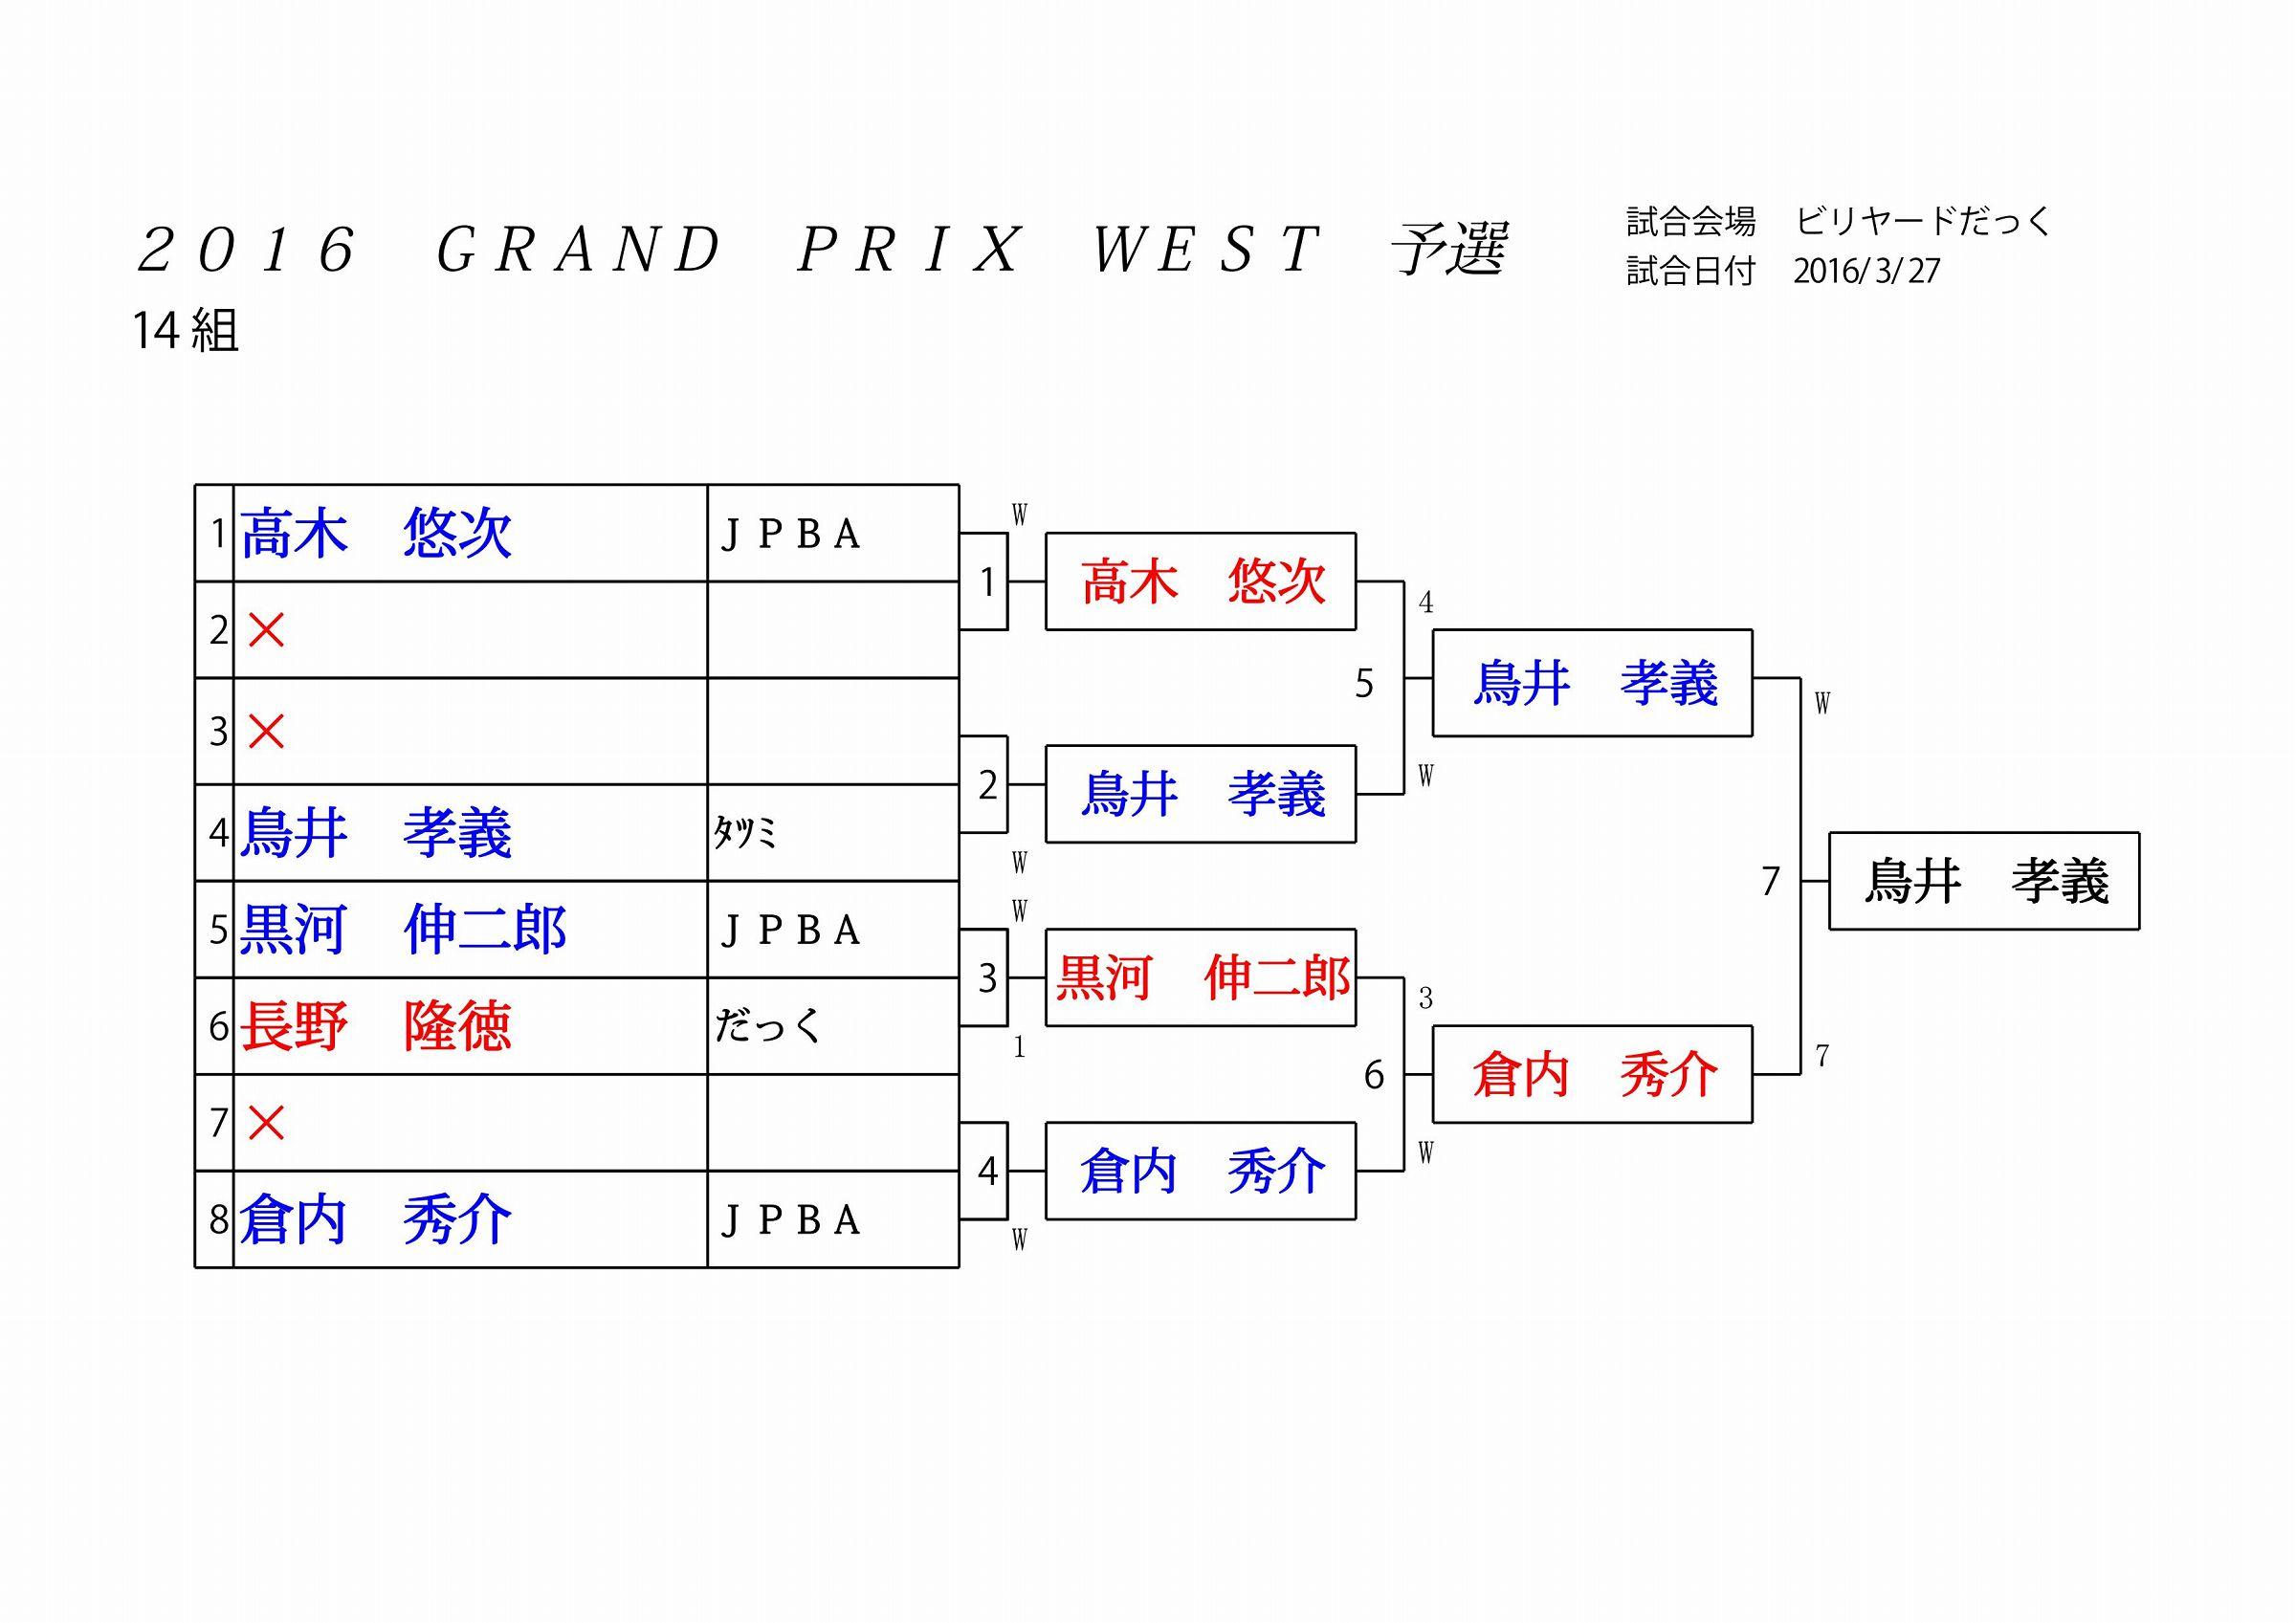 2016 GRAND PRIX WEST 予選_14